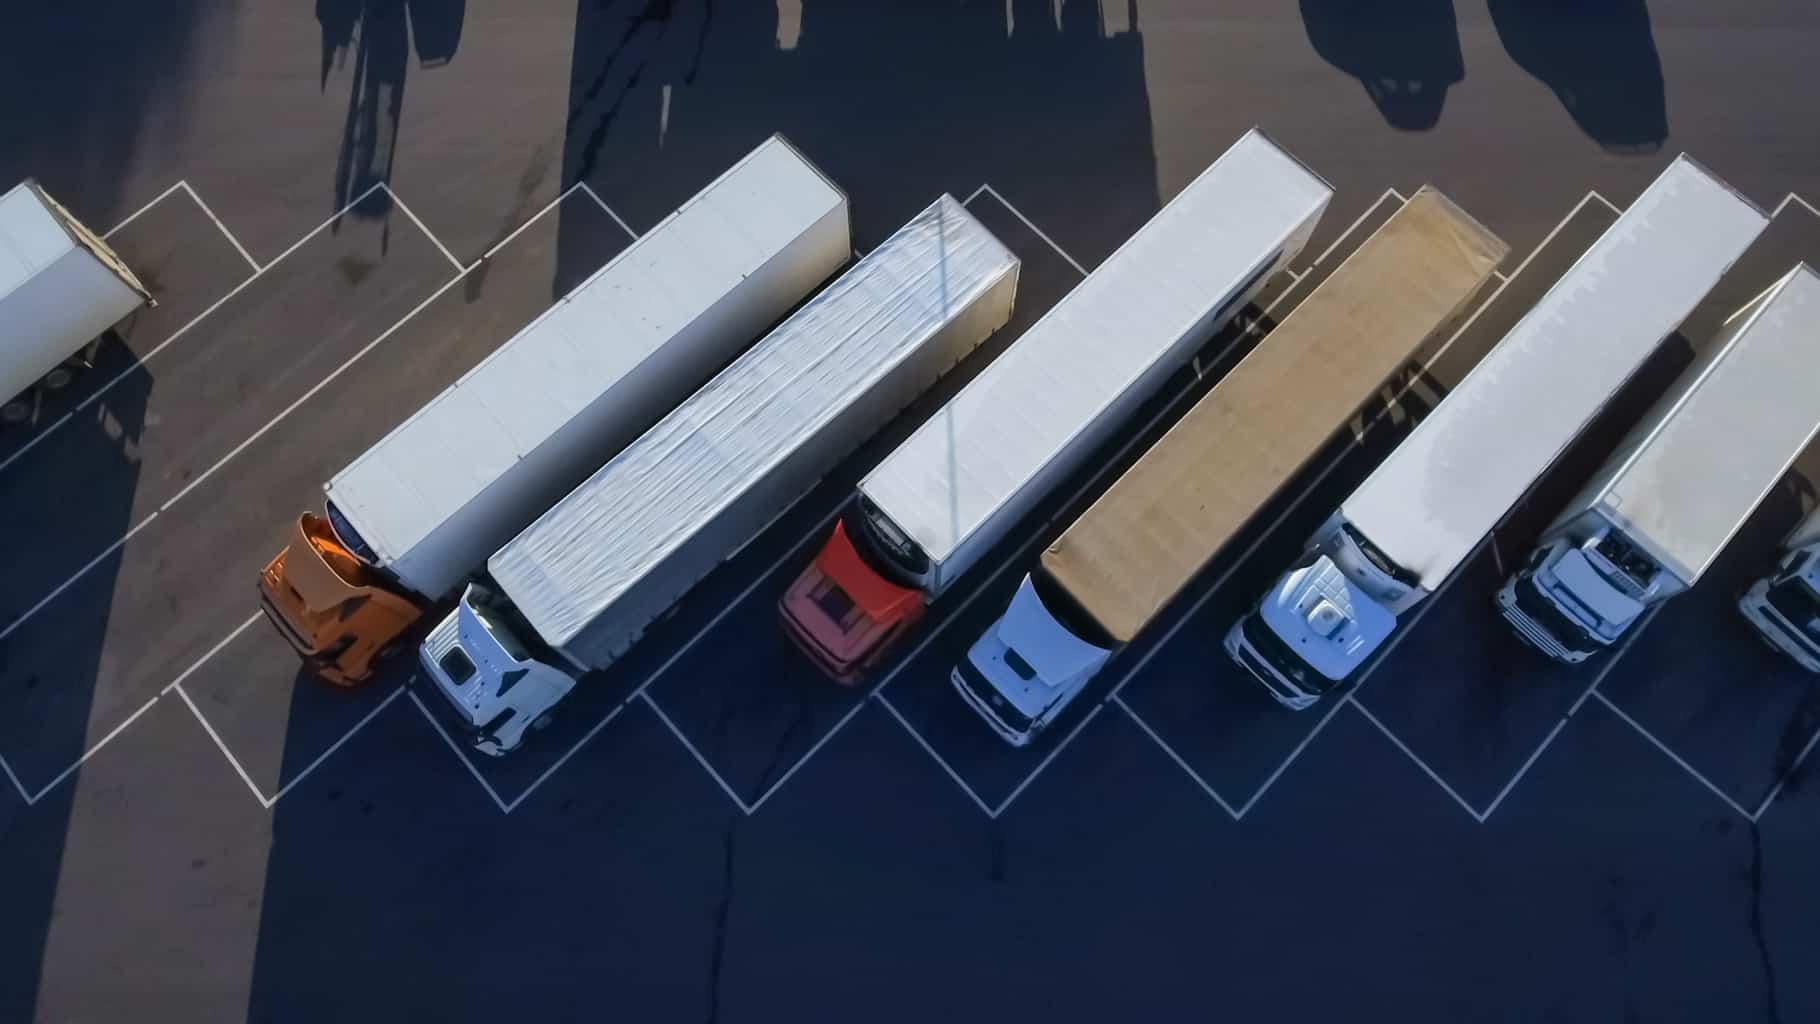 birds eye view of trucks in line